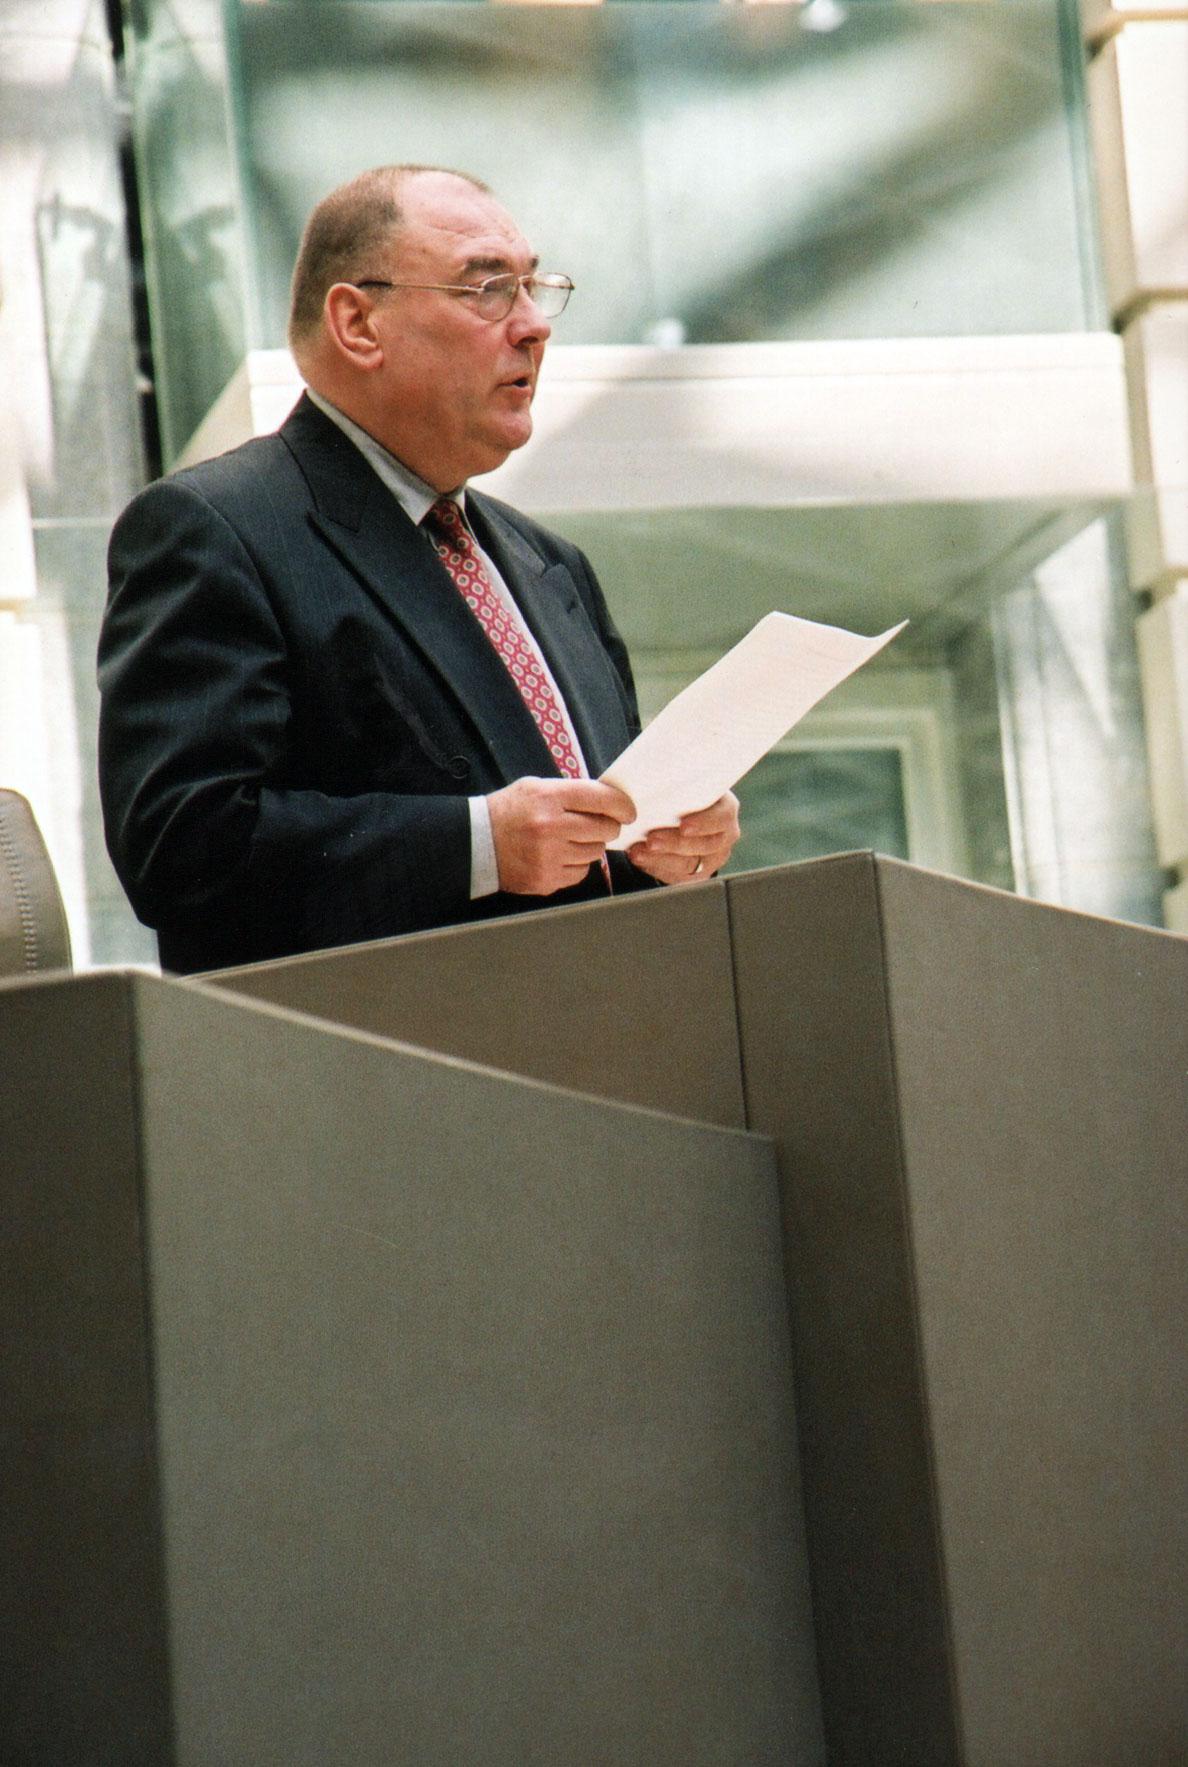 Huldezitting Paul Van Grembergen, 31 maart 2004